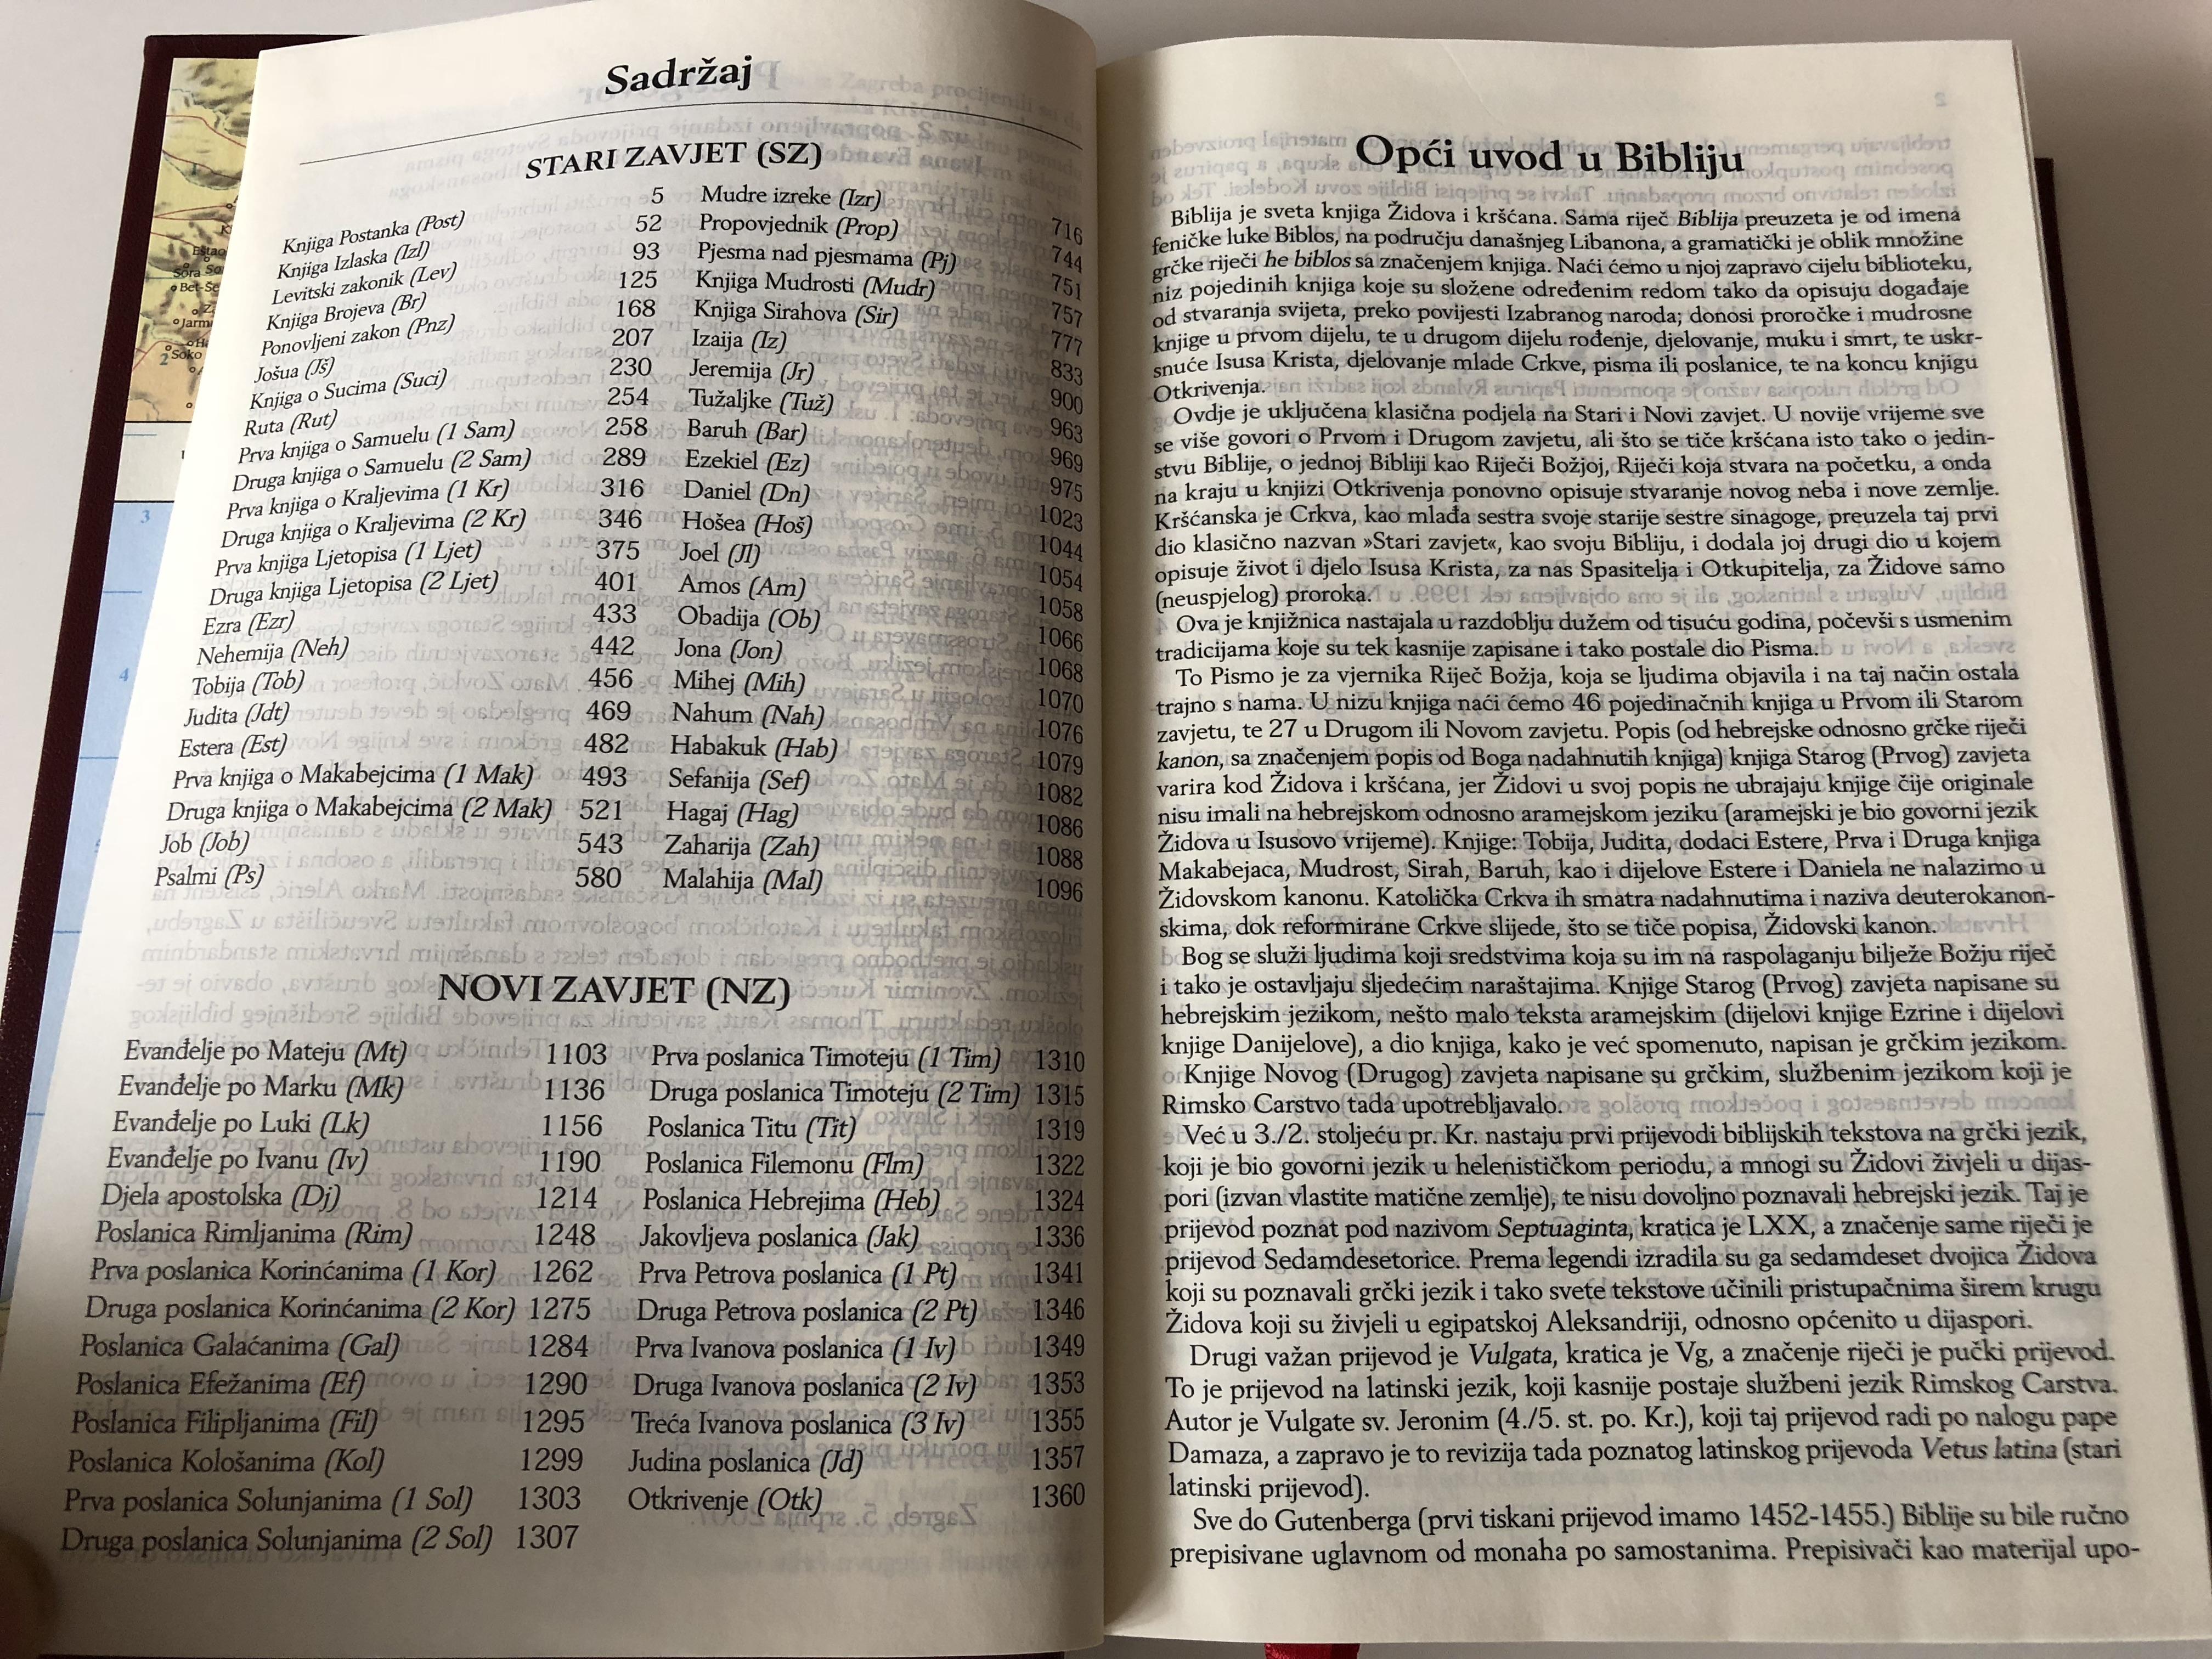 croatian-bible-with-deuterocanonical-books-burg-6-.jpg